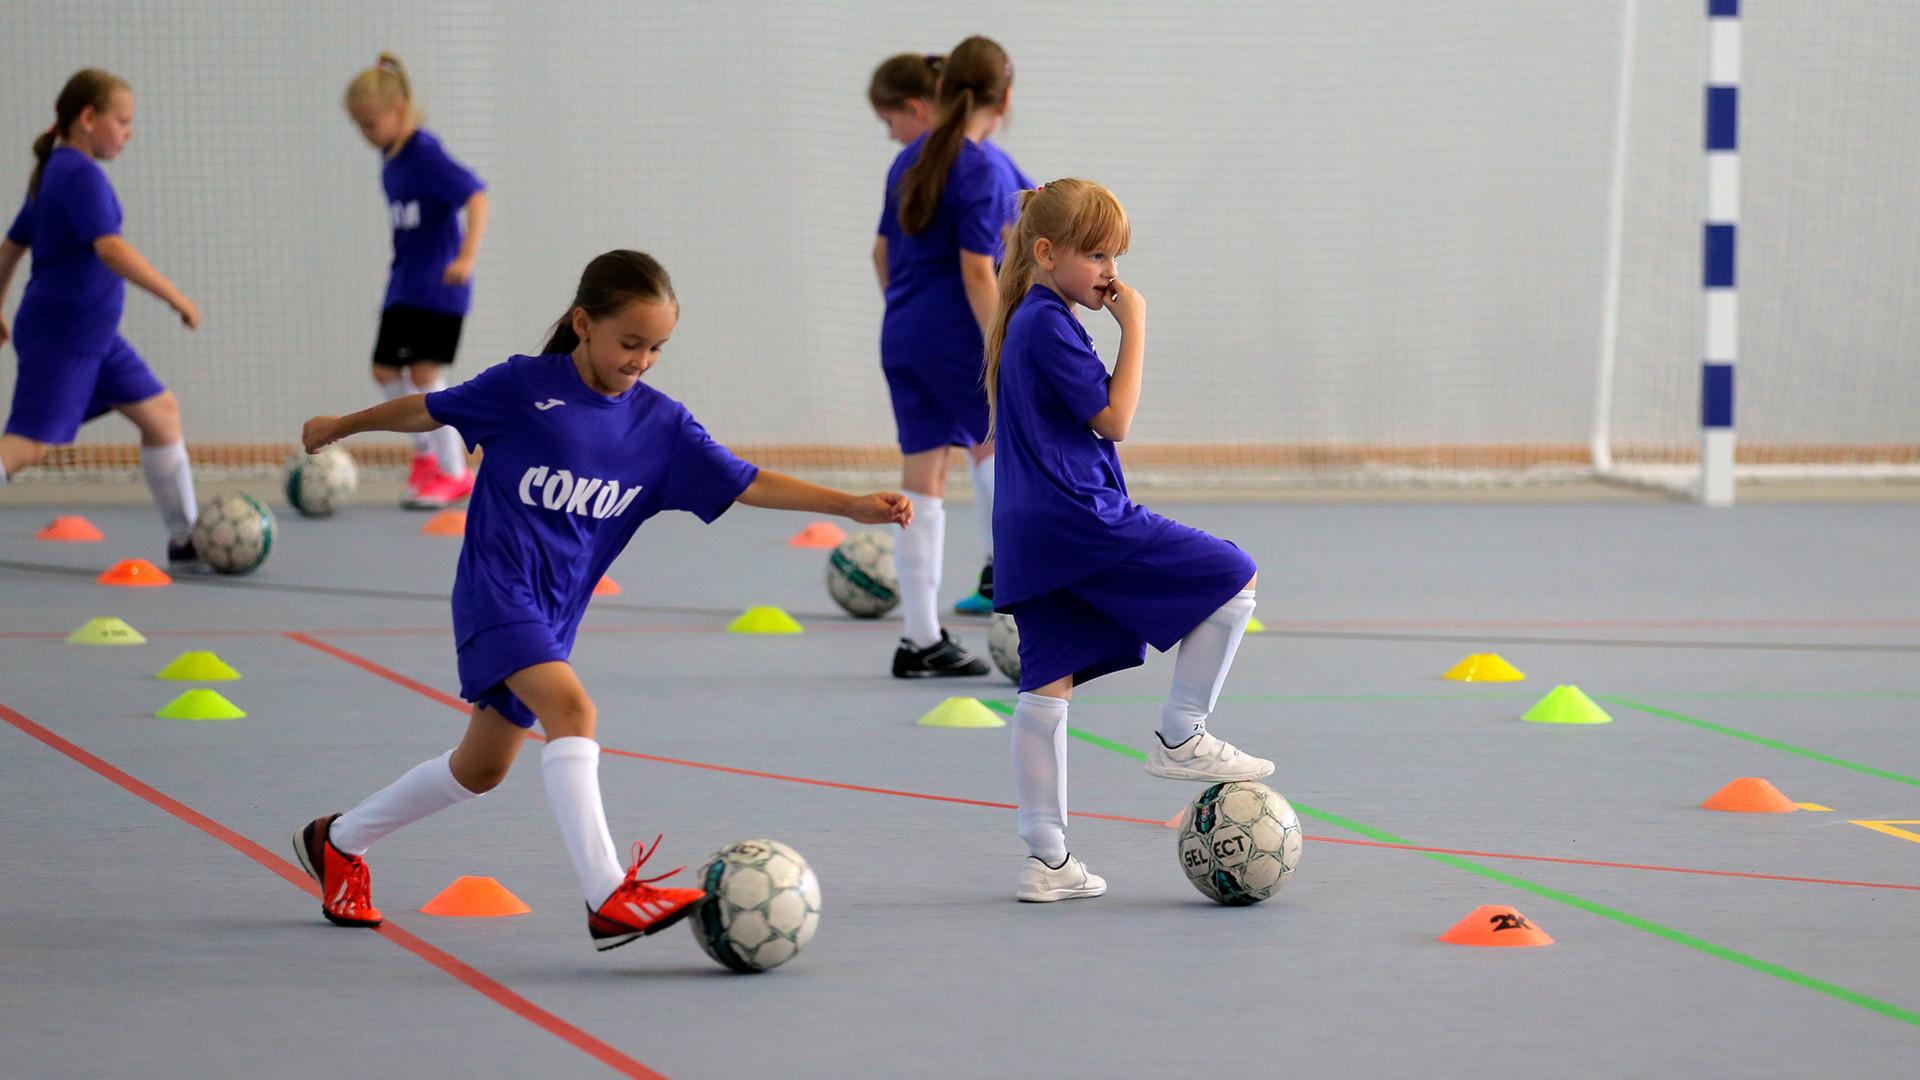 Gadis-gadis saat sesi latihan sepak bola.